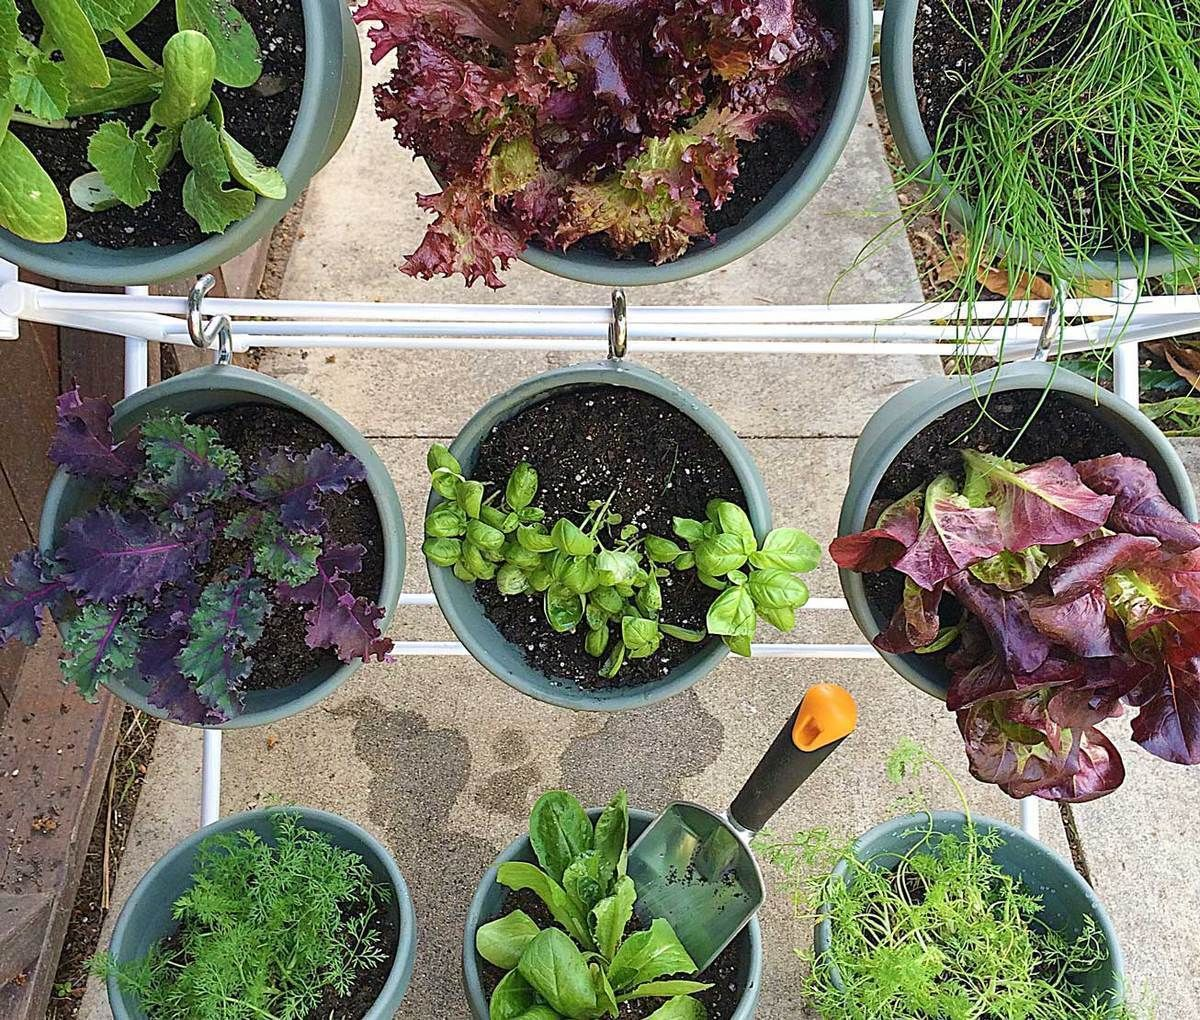 DIY Vertical Hanging Herb Garden Diy herb garden, Herb